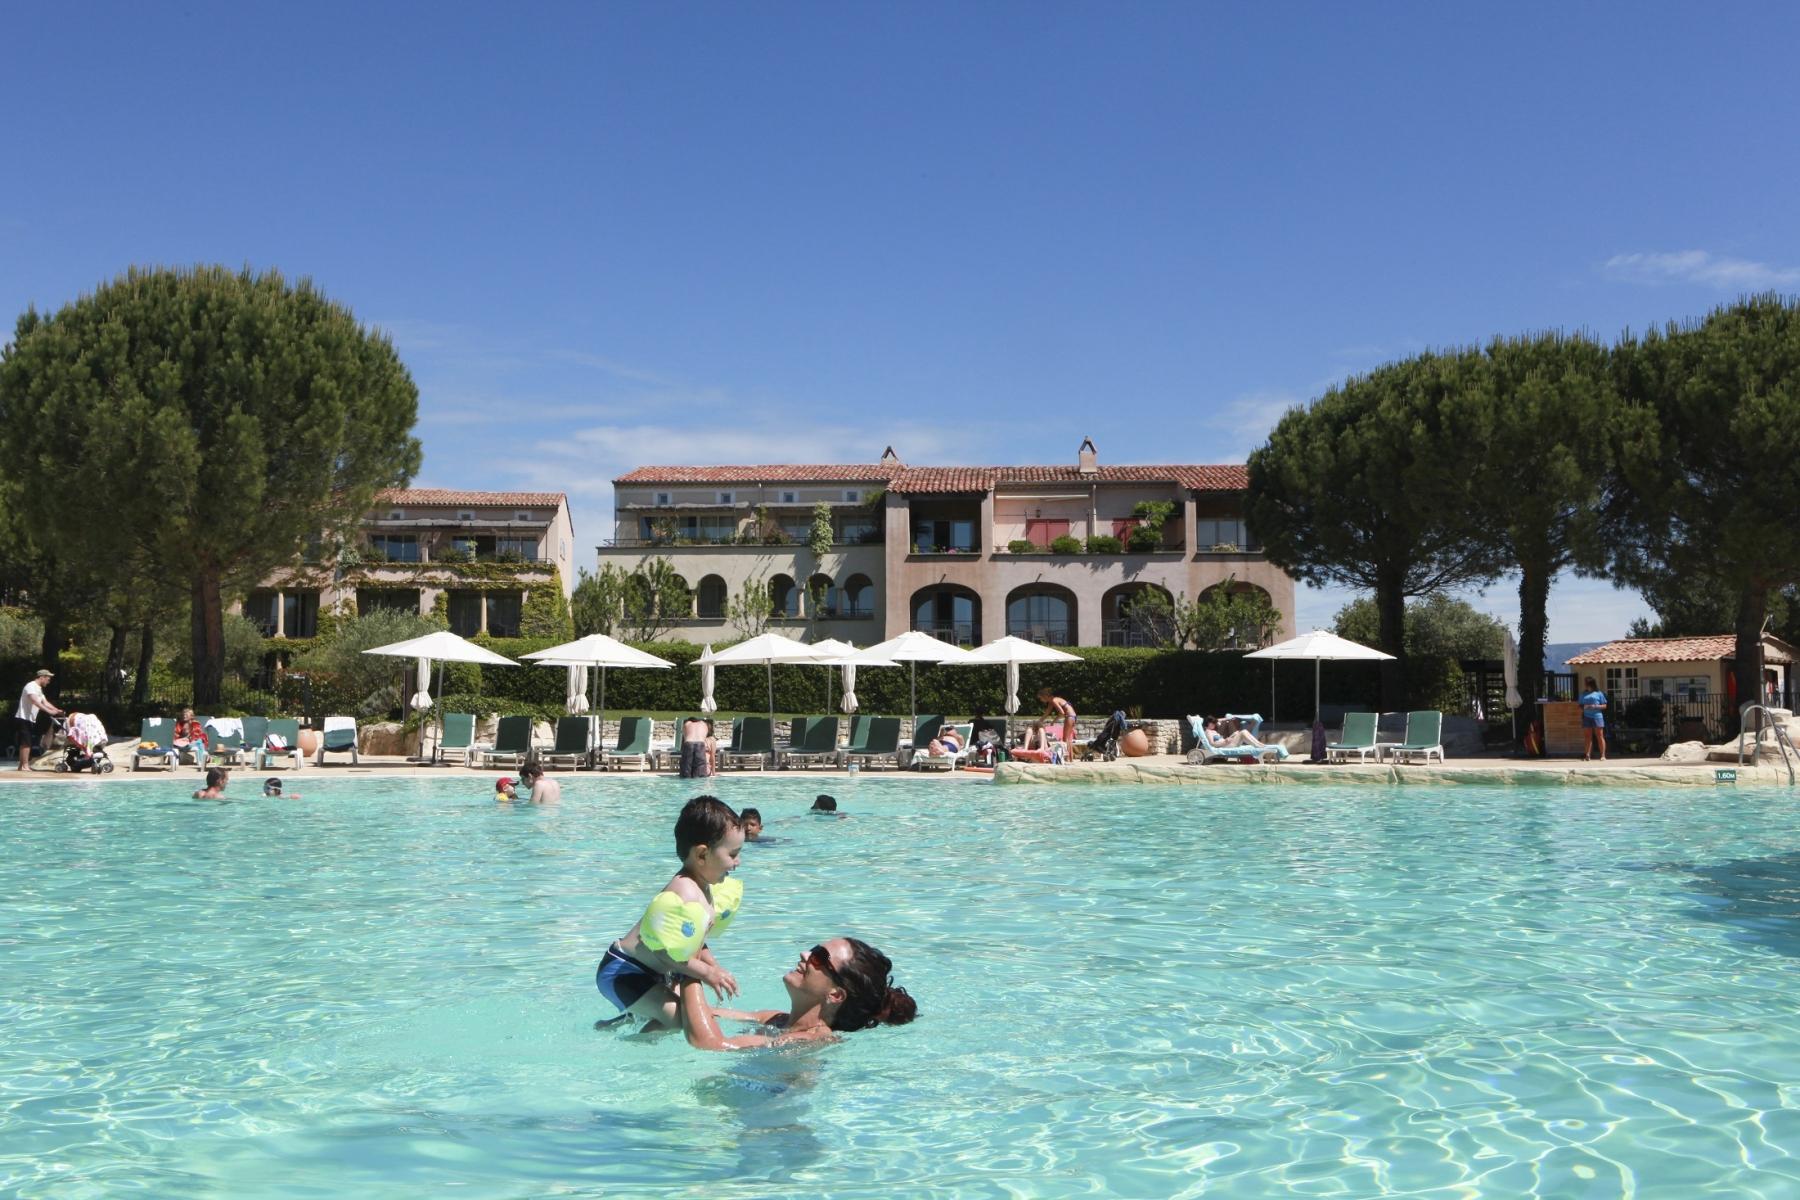 Aanbieding vakantiehuisje Middellandse Zee 🏕️Pierre & Vacances Village Pont-Royal en Provence